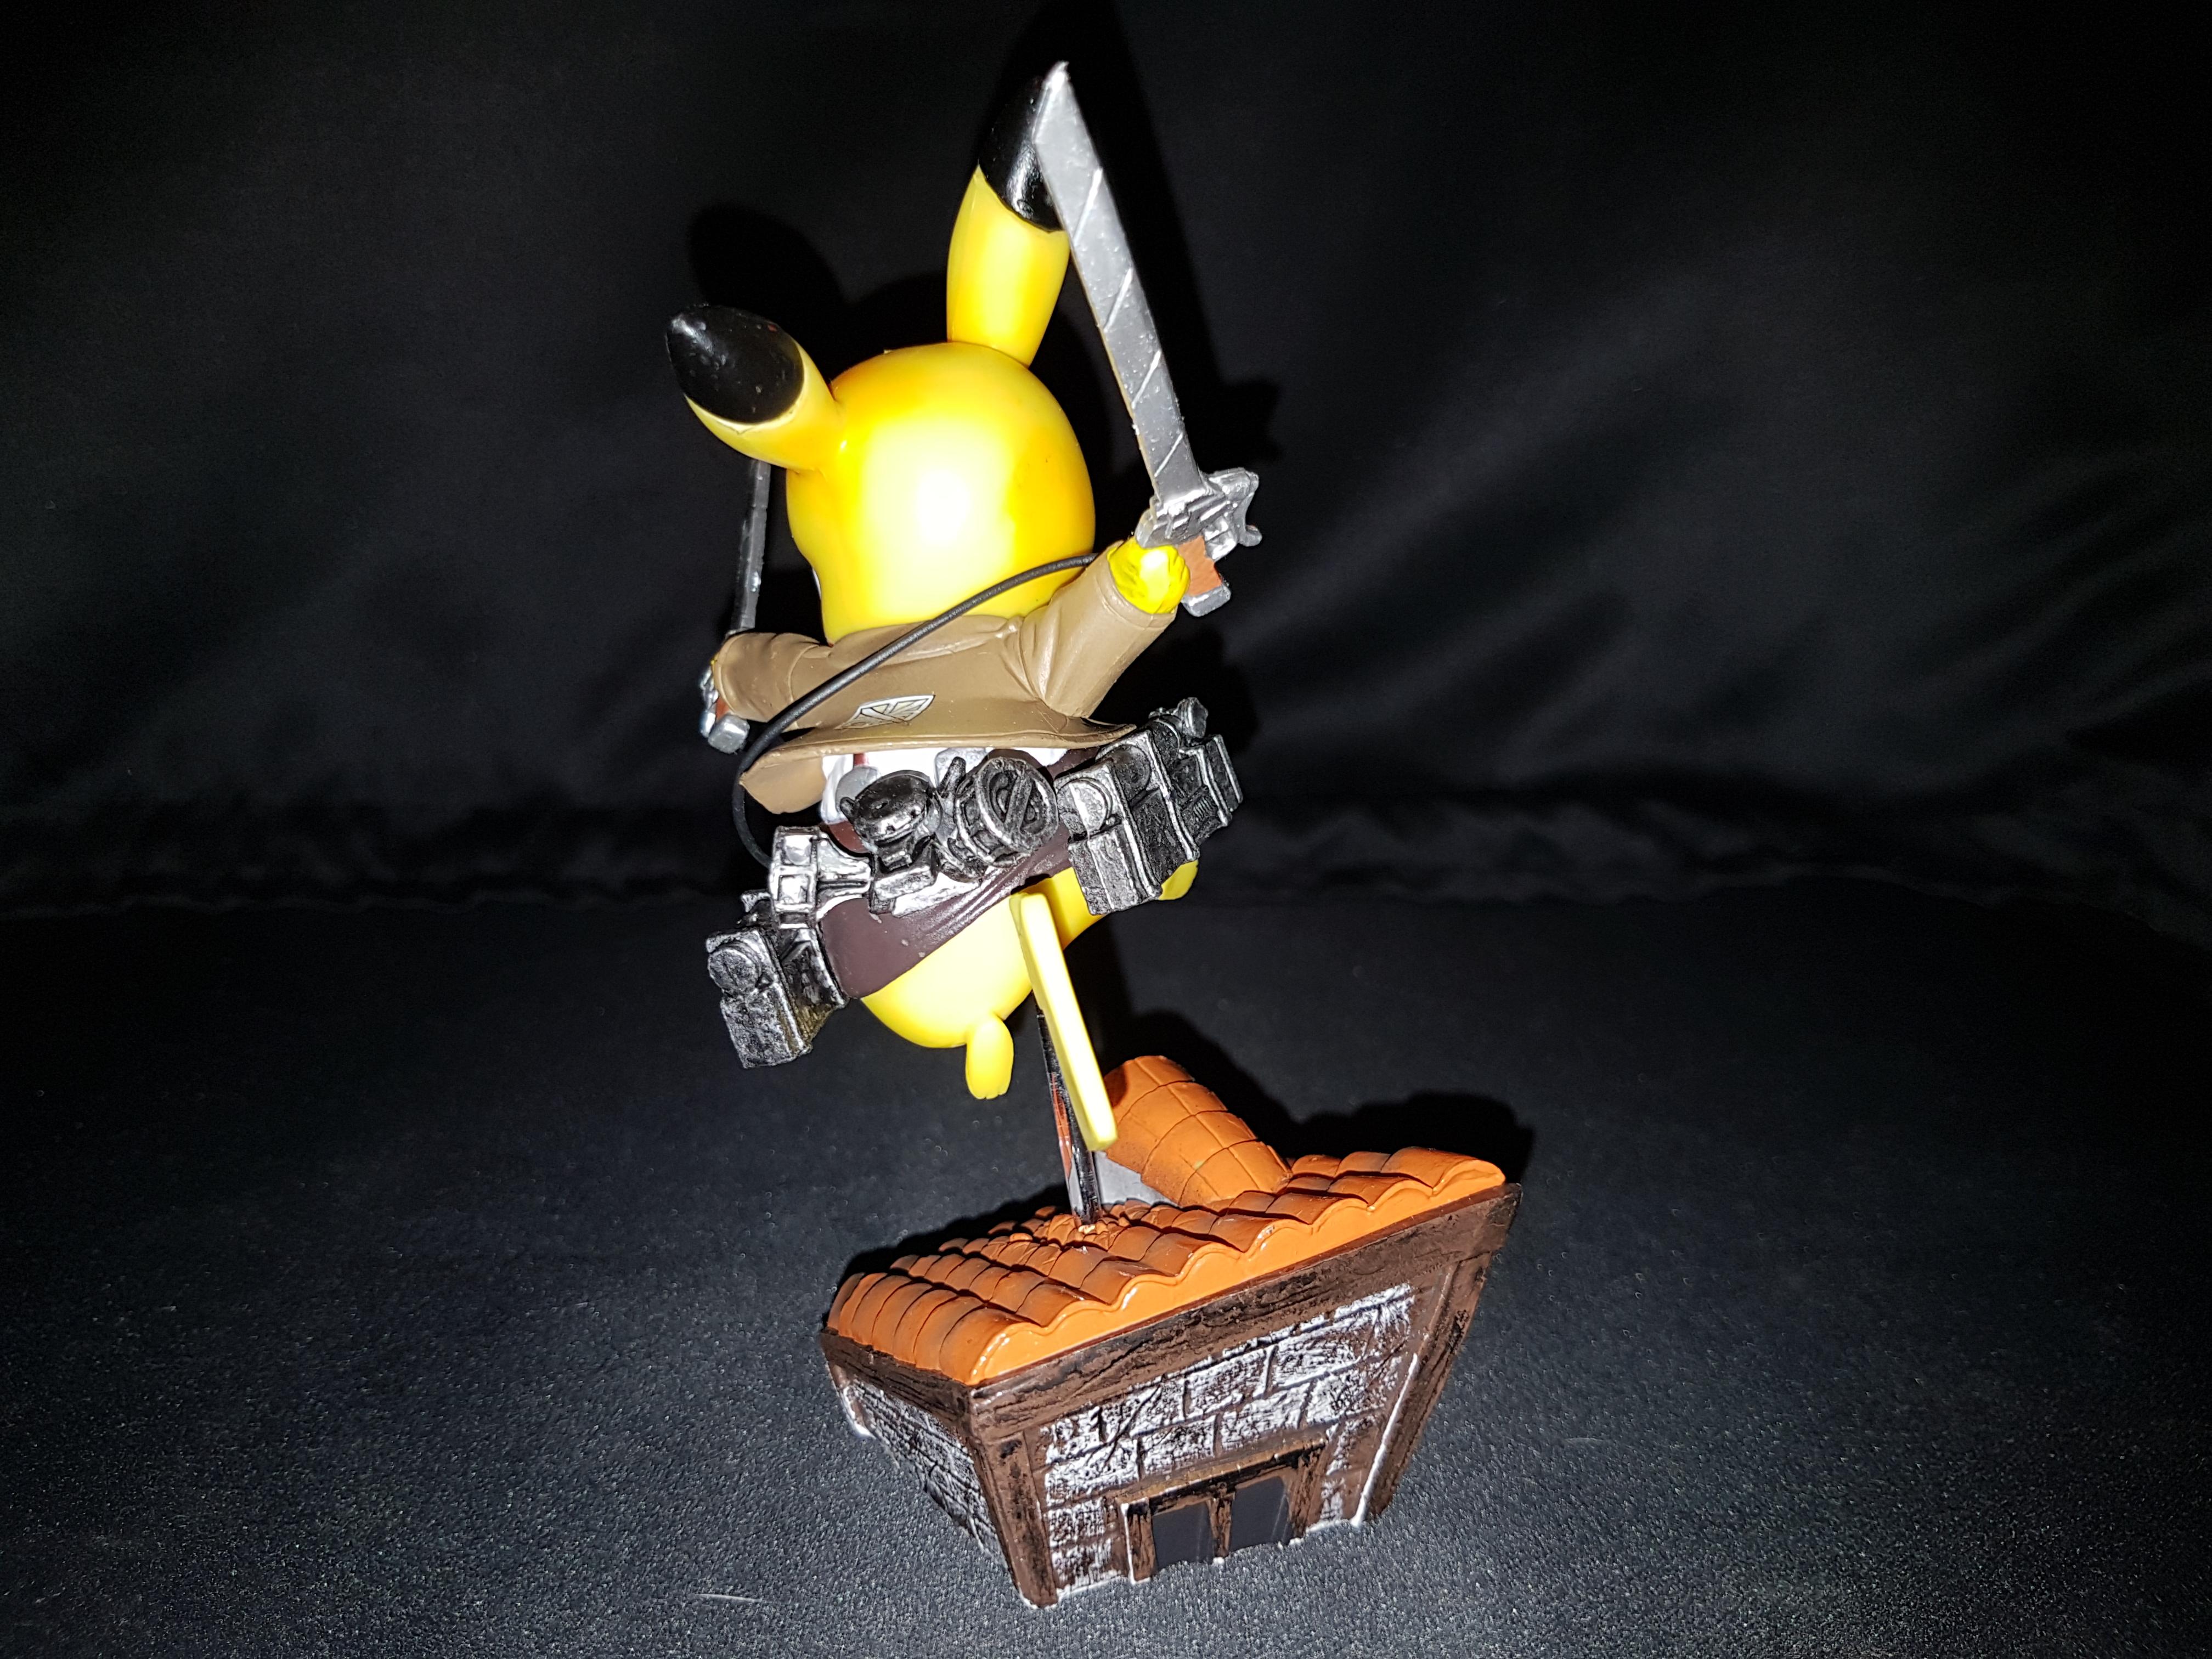 Figurine pikachu attack on titans 4